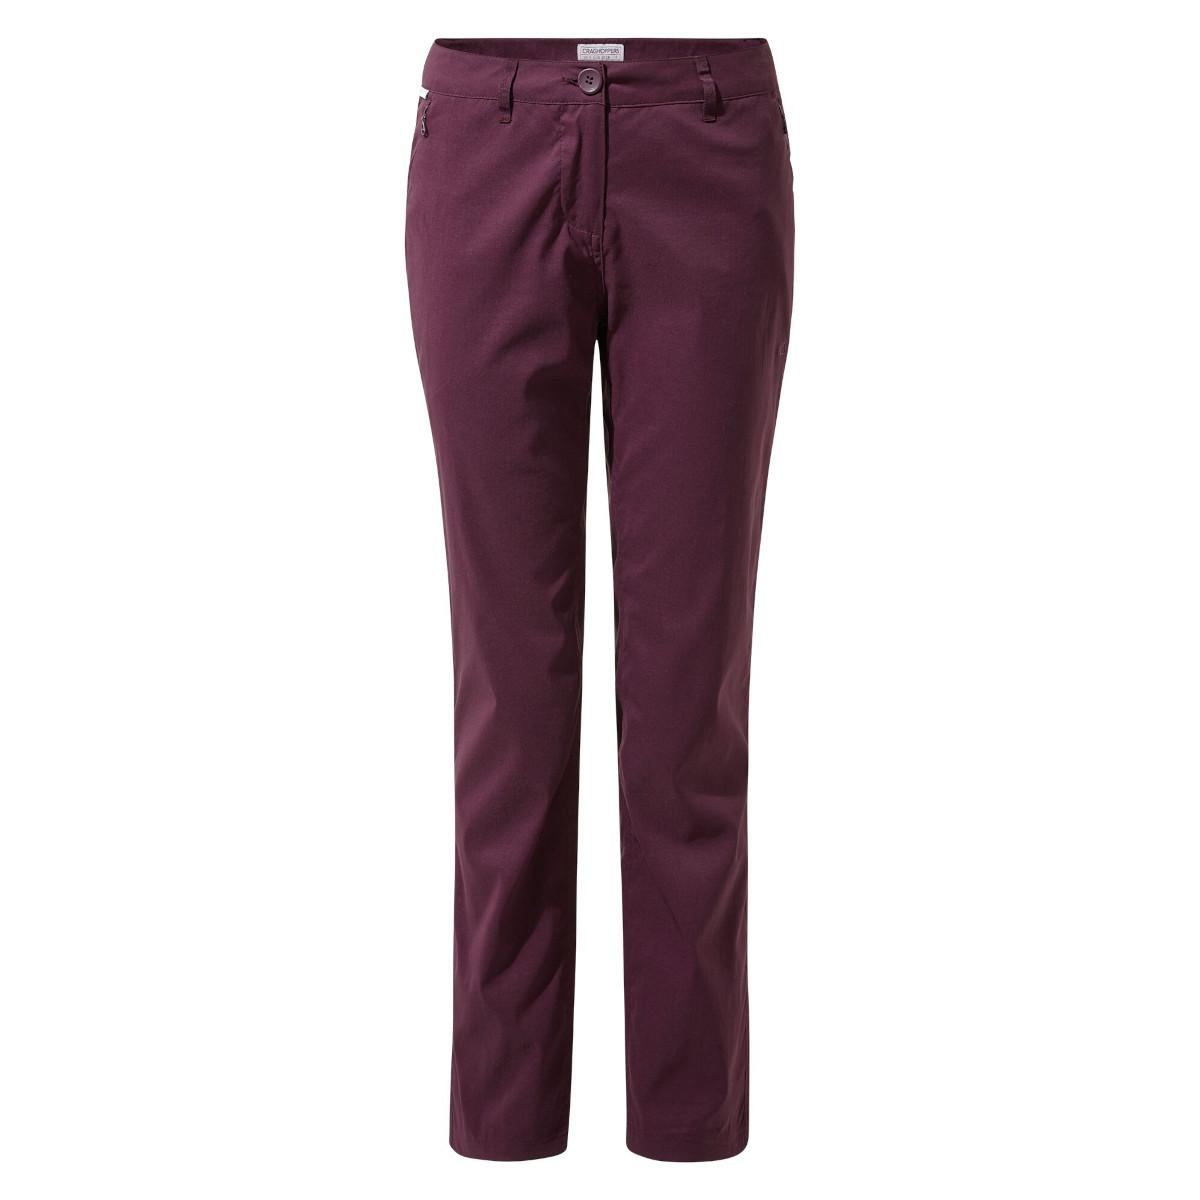 Craghoppers Kiwi Pro II Women's Trouser - Potent Plum